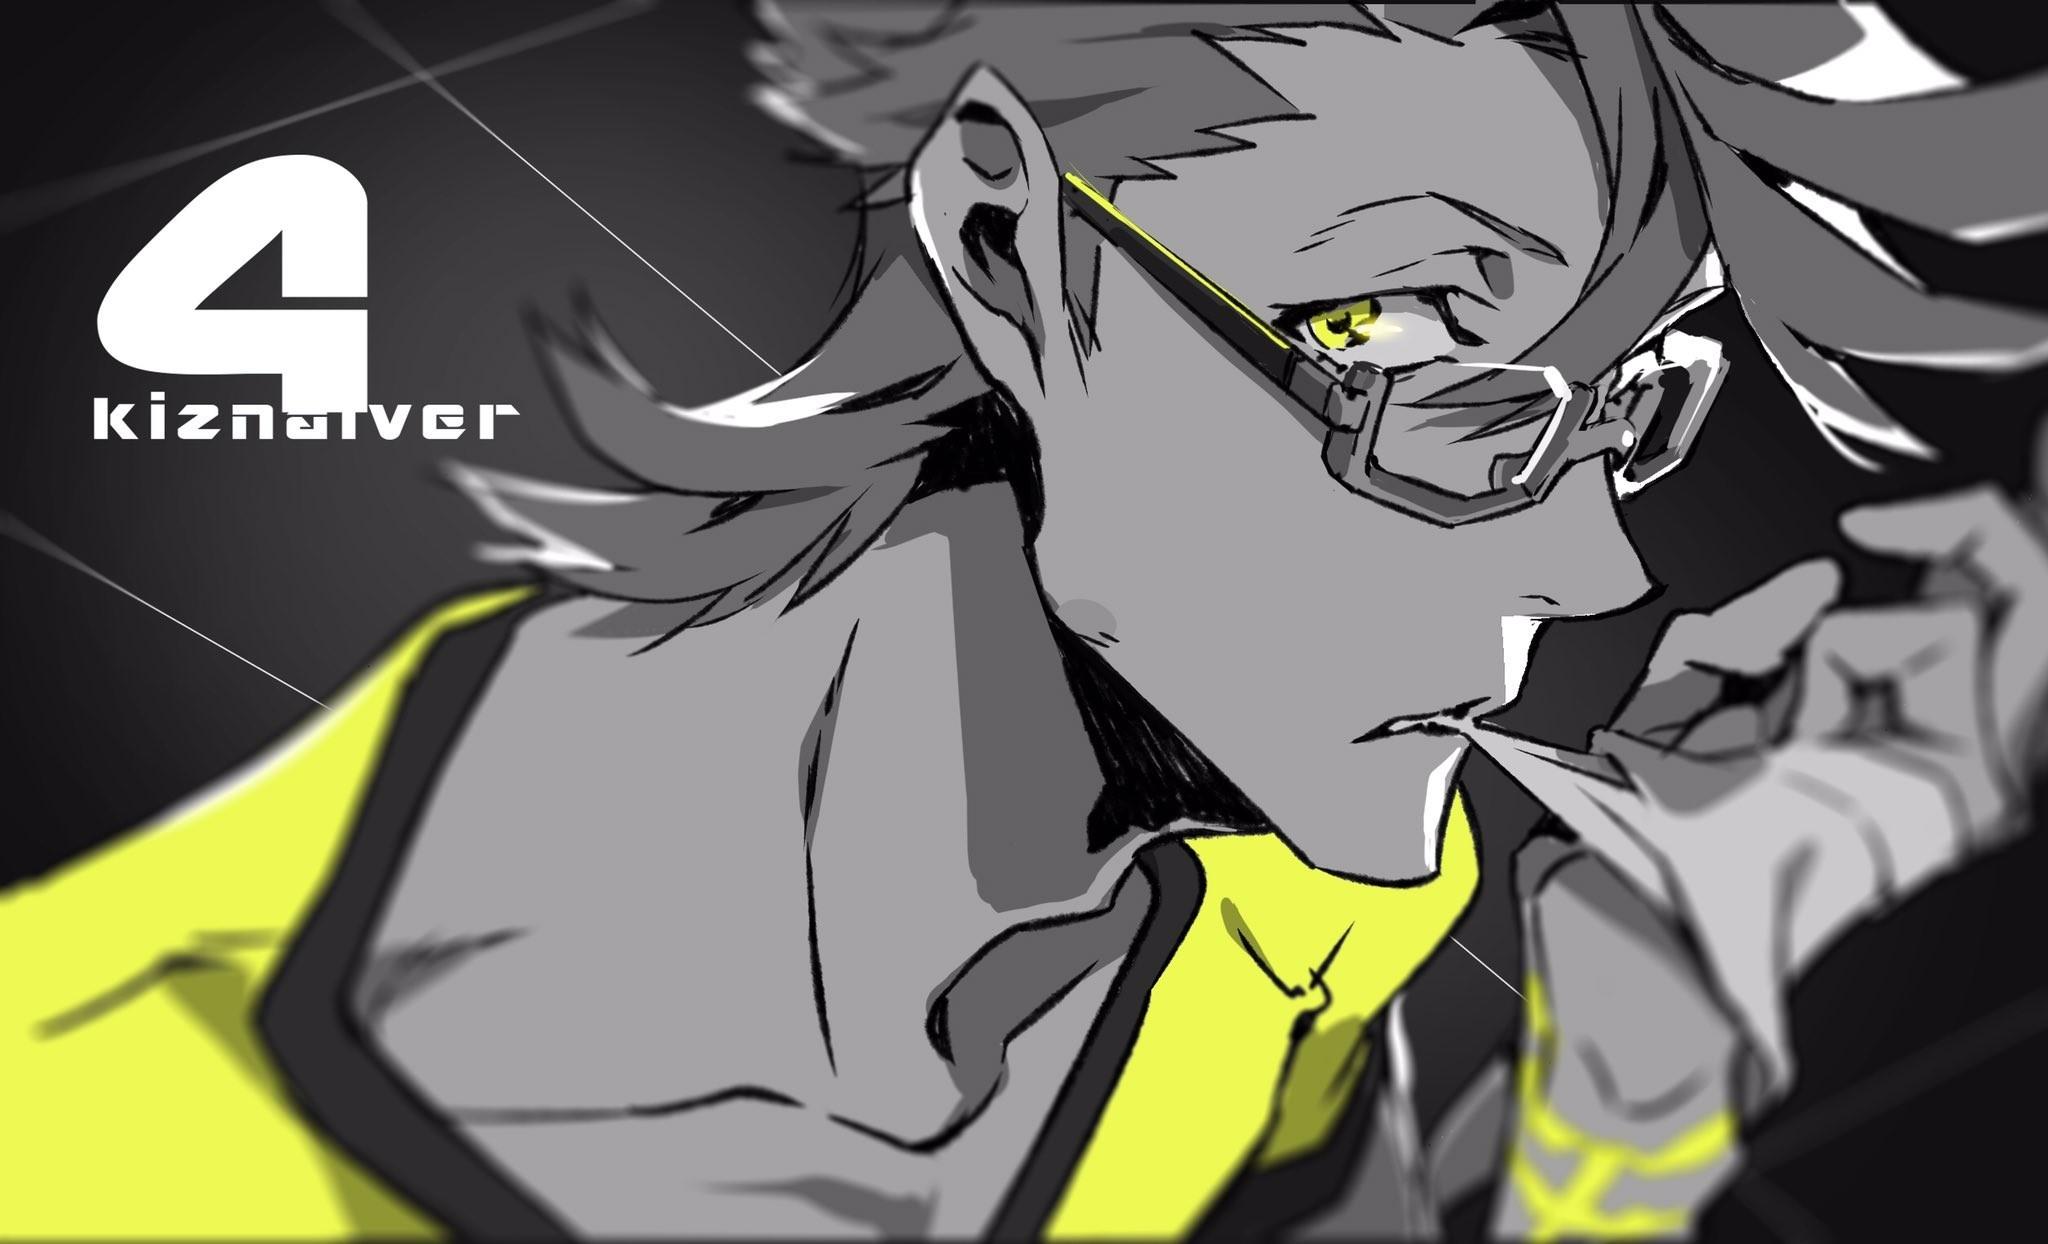 Anime Kiznaiver